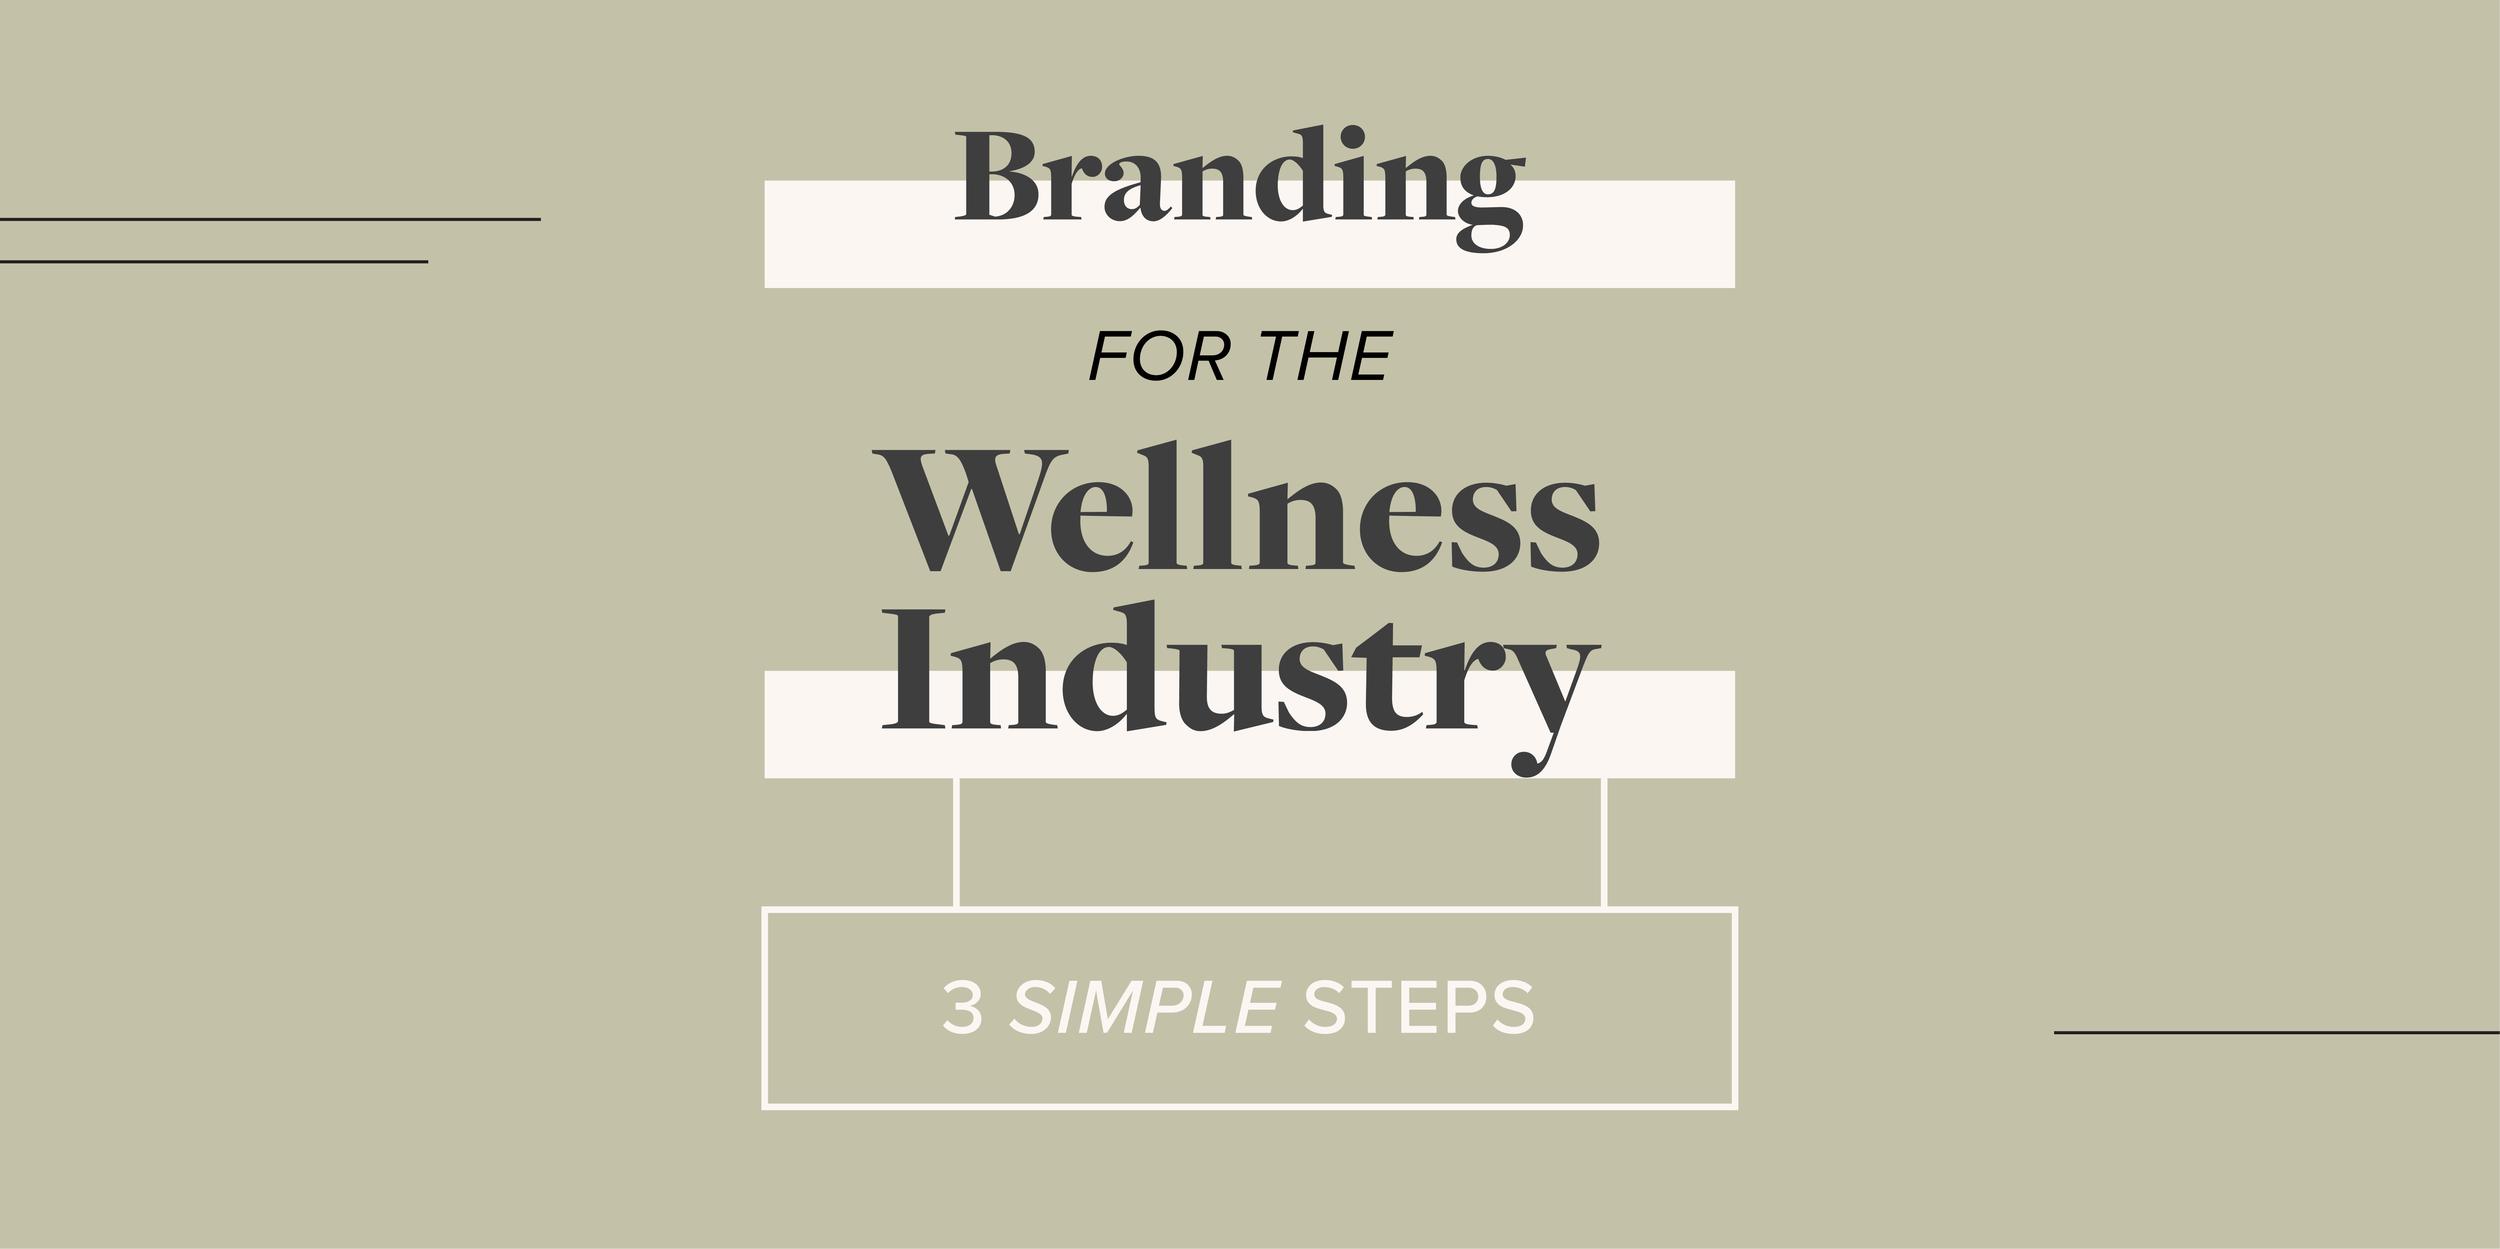 brandingwellnessindustry